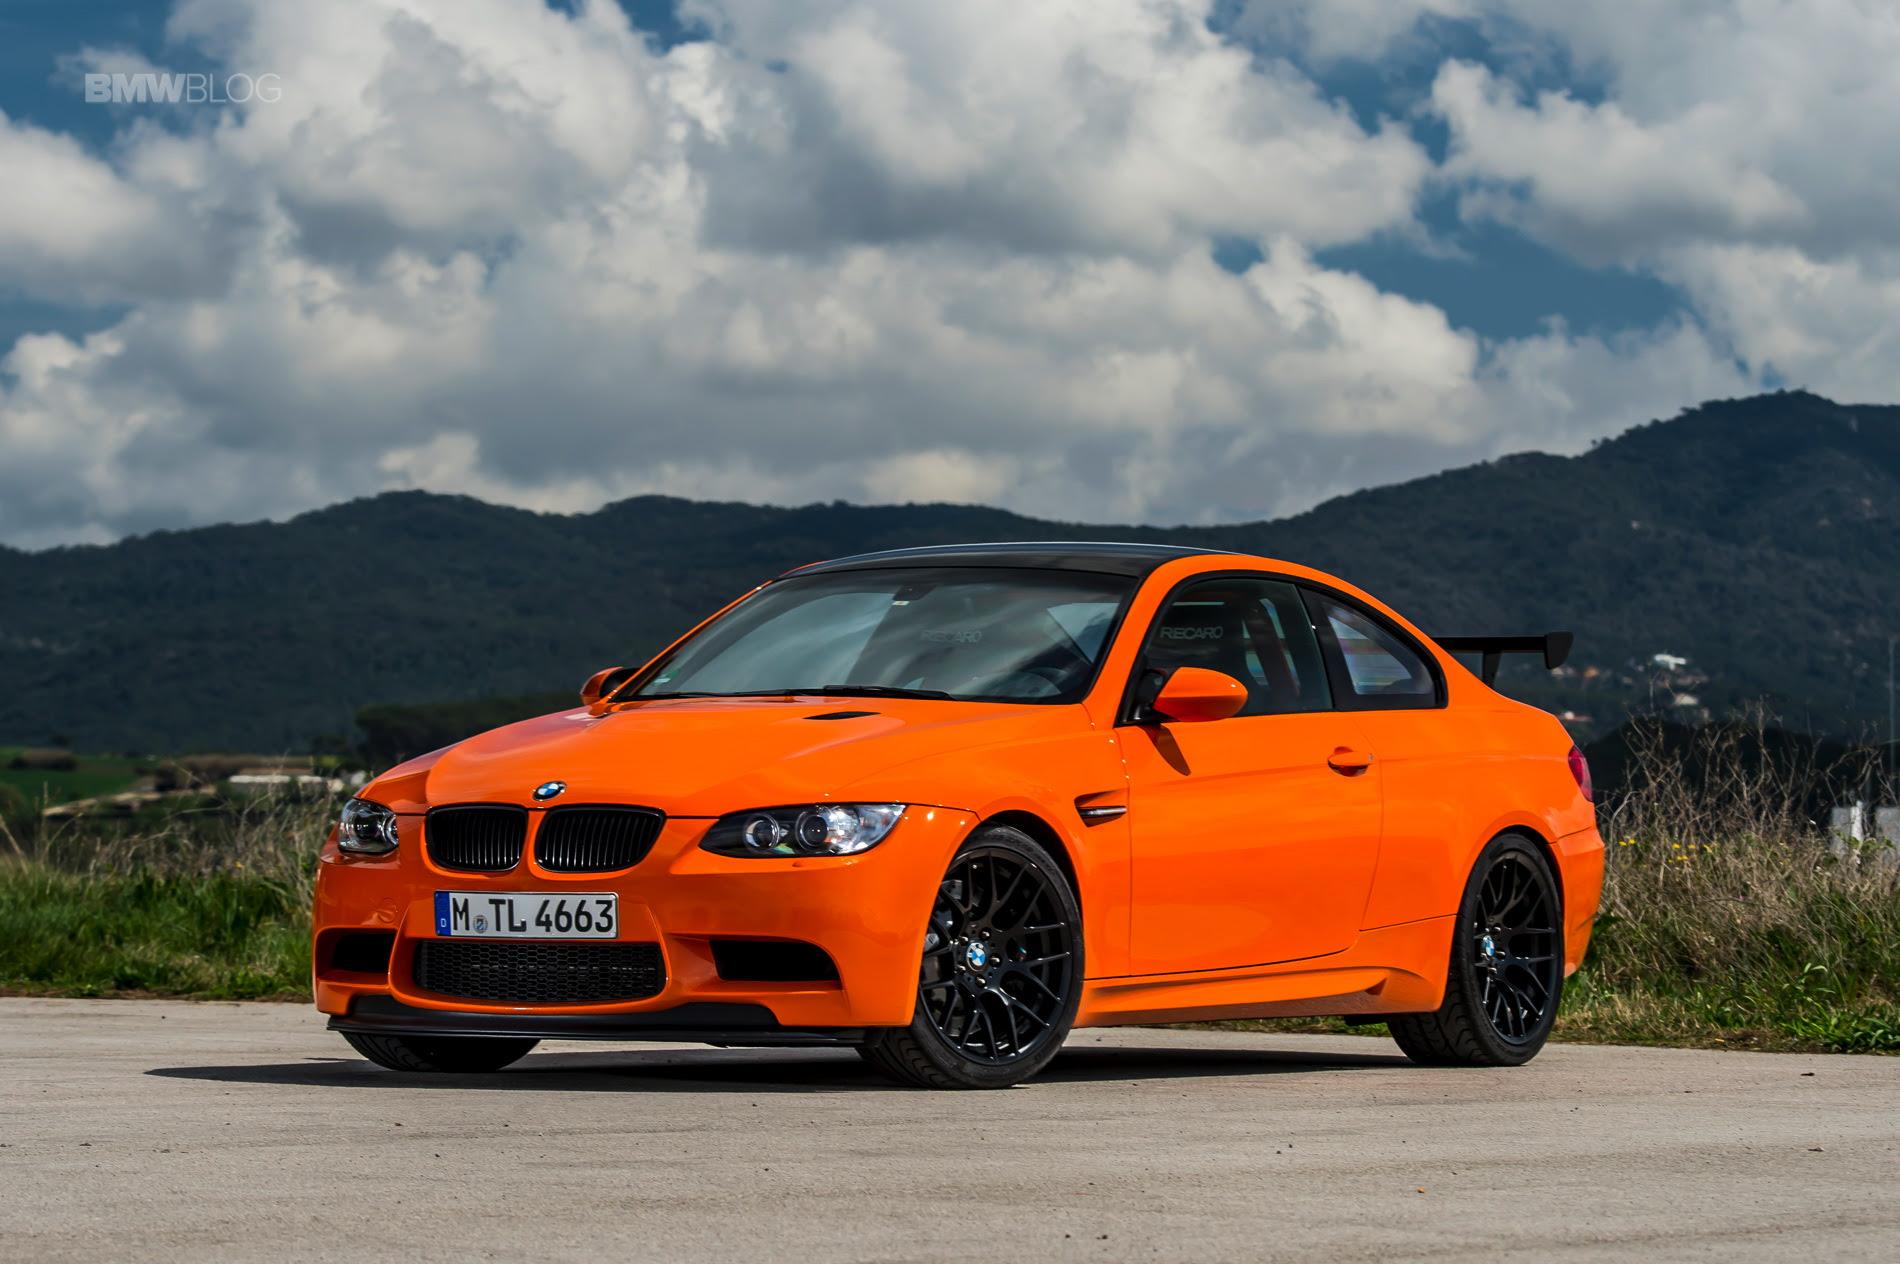 BMW CSI keyring 635 CSL E9 3.0 850 E31 E24 630 M6 CS 6 SERIES M emblem keychain